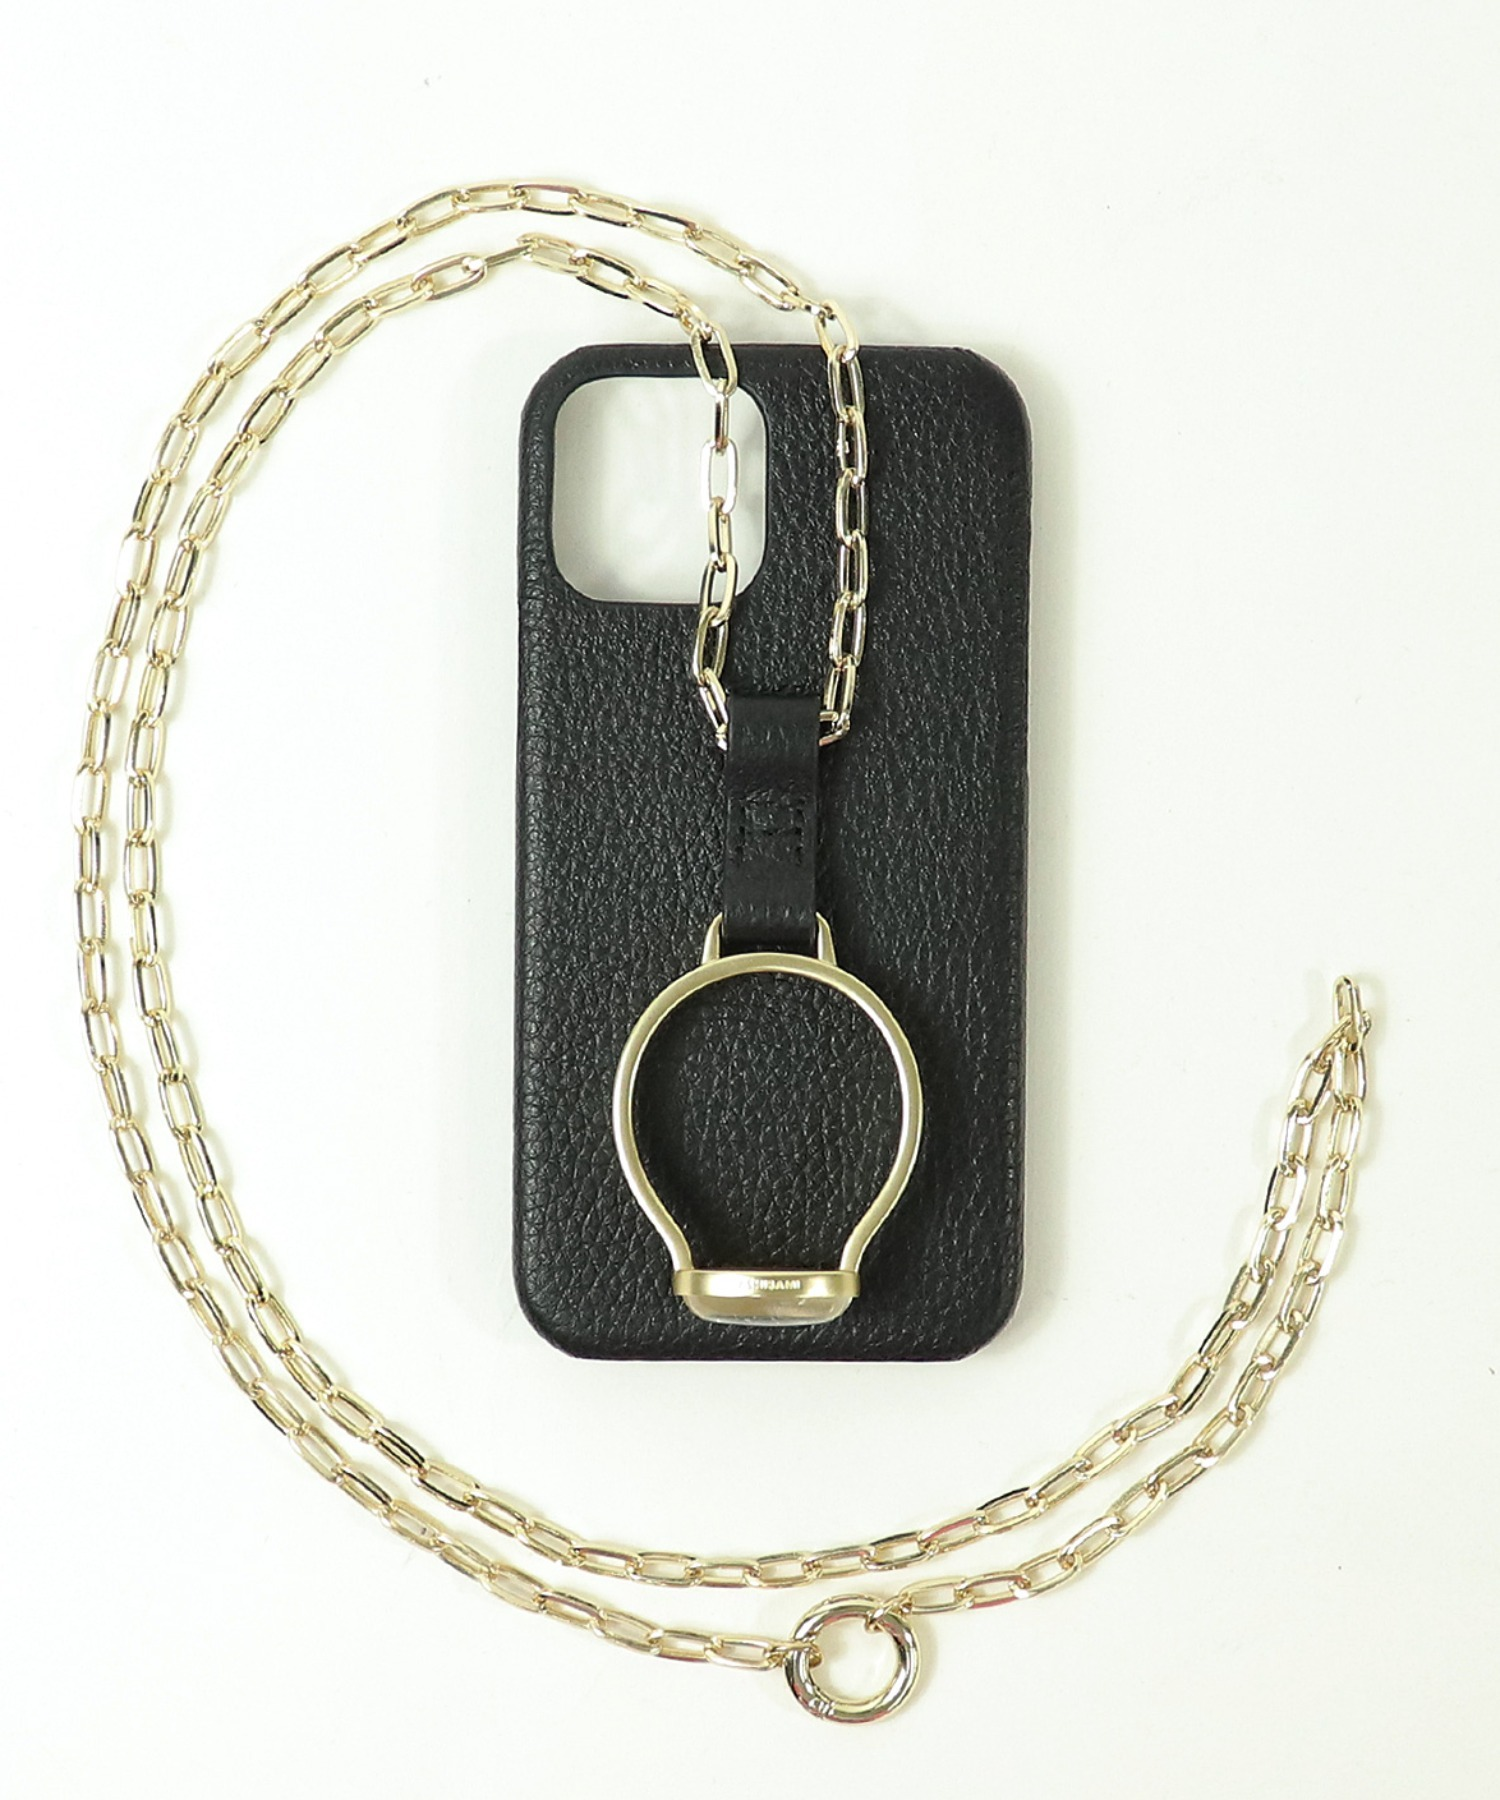 【 Hashibami / ハシバミ 】別注 iphone12/12pro 天然石×チェーン スマホ・携帯カバー リング付きケース